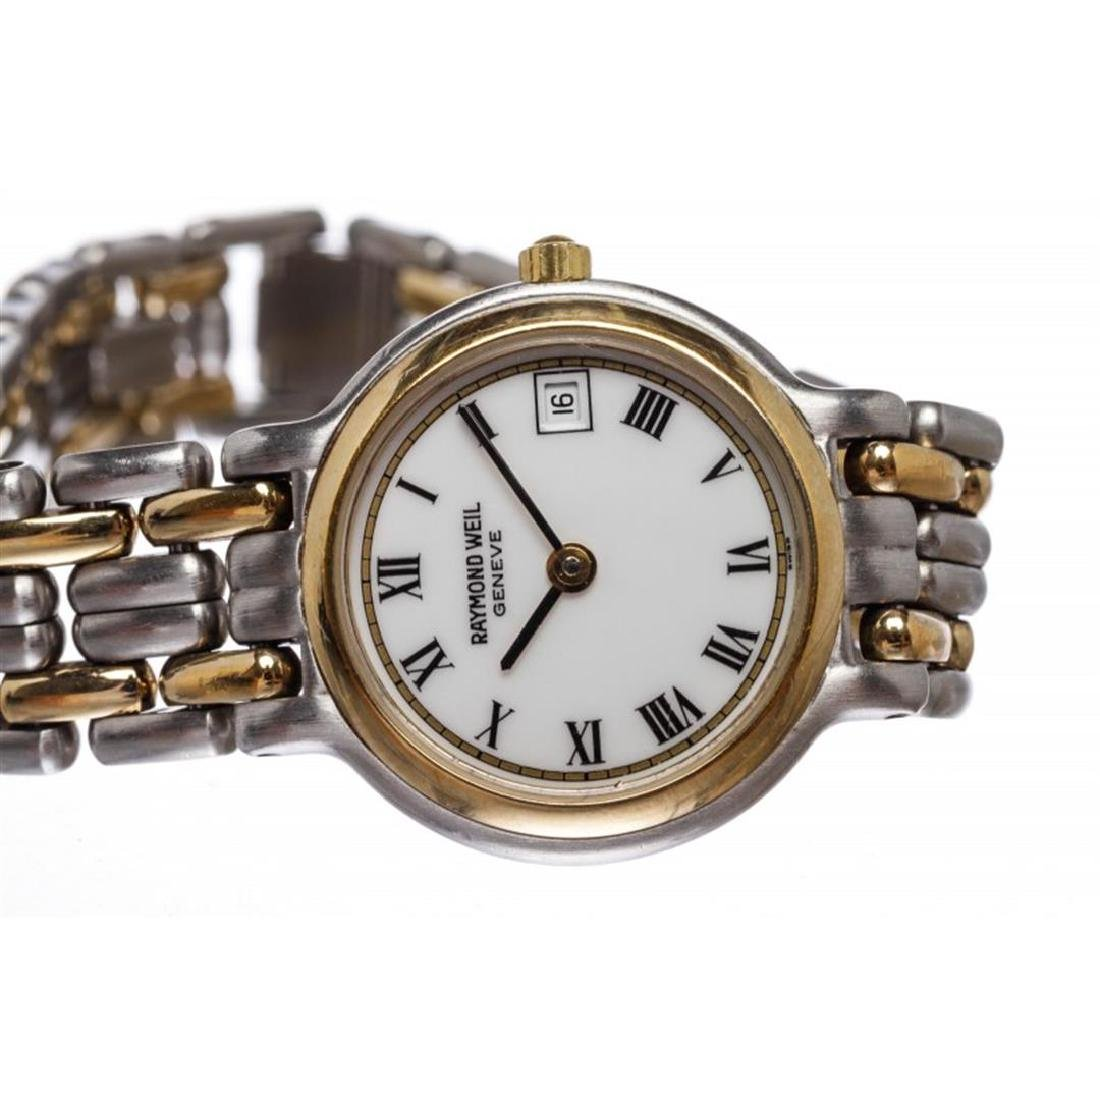 Raymond Weil Geneve Quartz Stainless Steel Wristwatch - 7